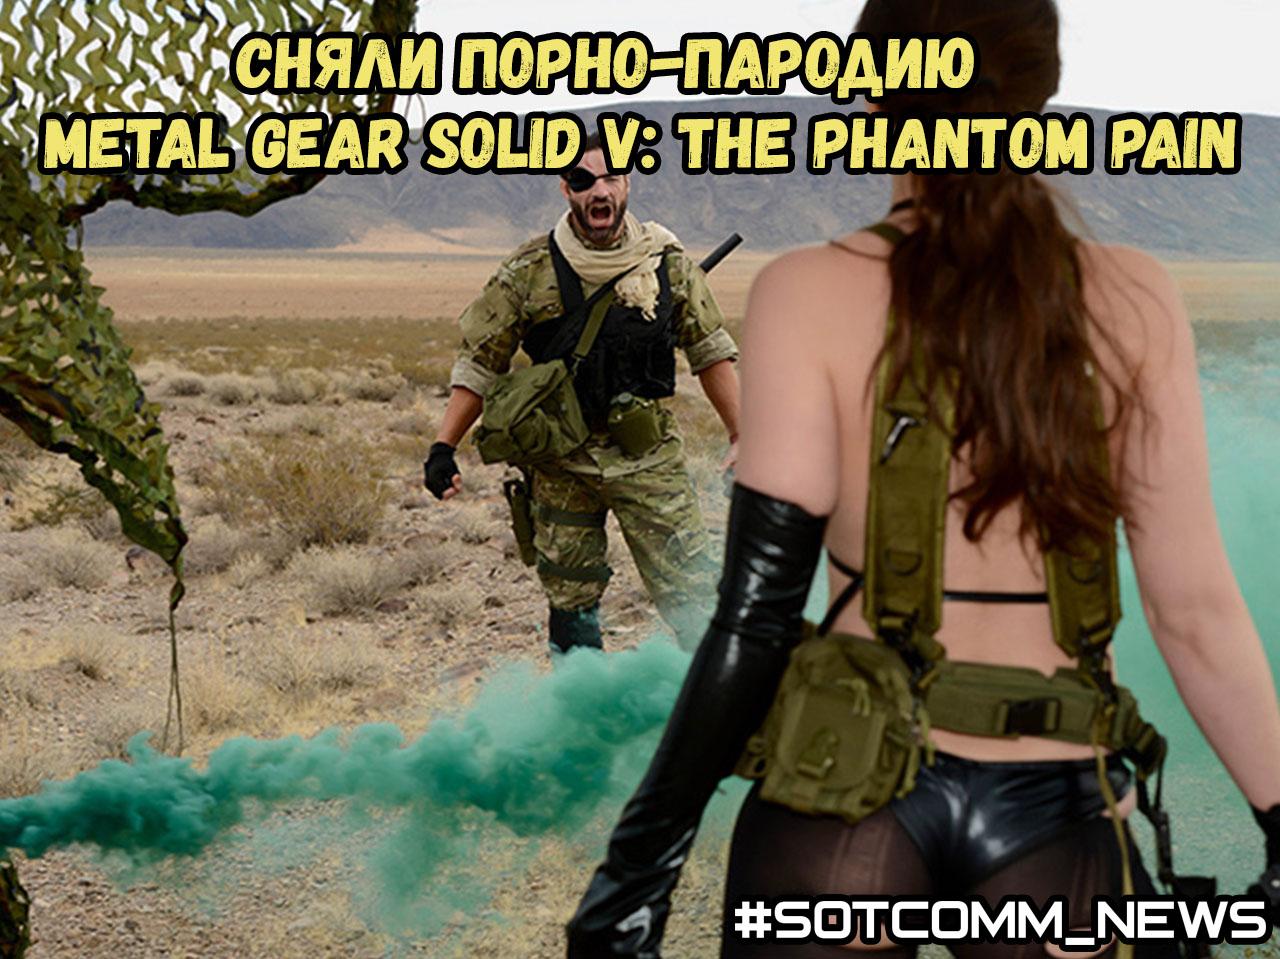 Xxx пародия Metal Rear Solid The Phantom Peen